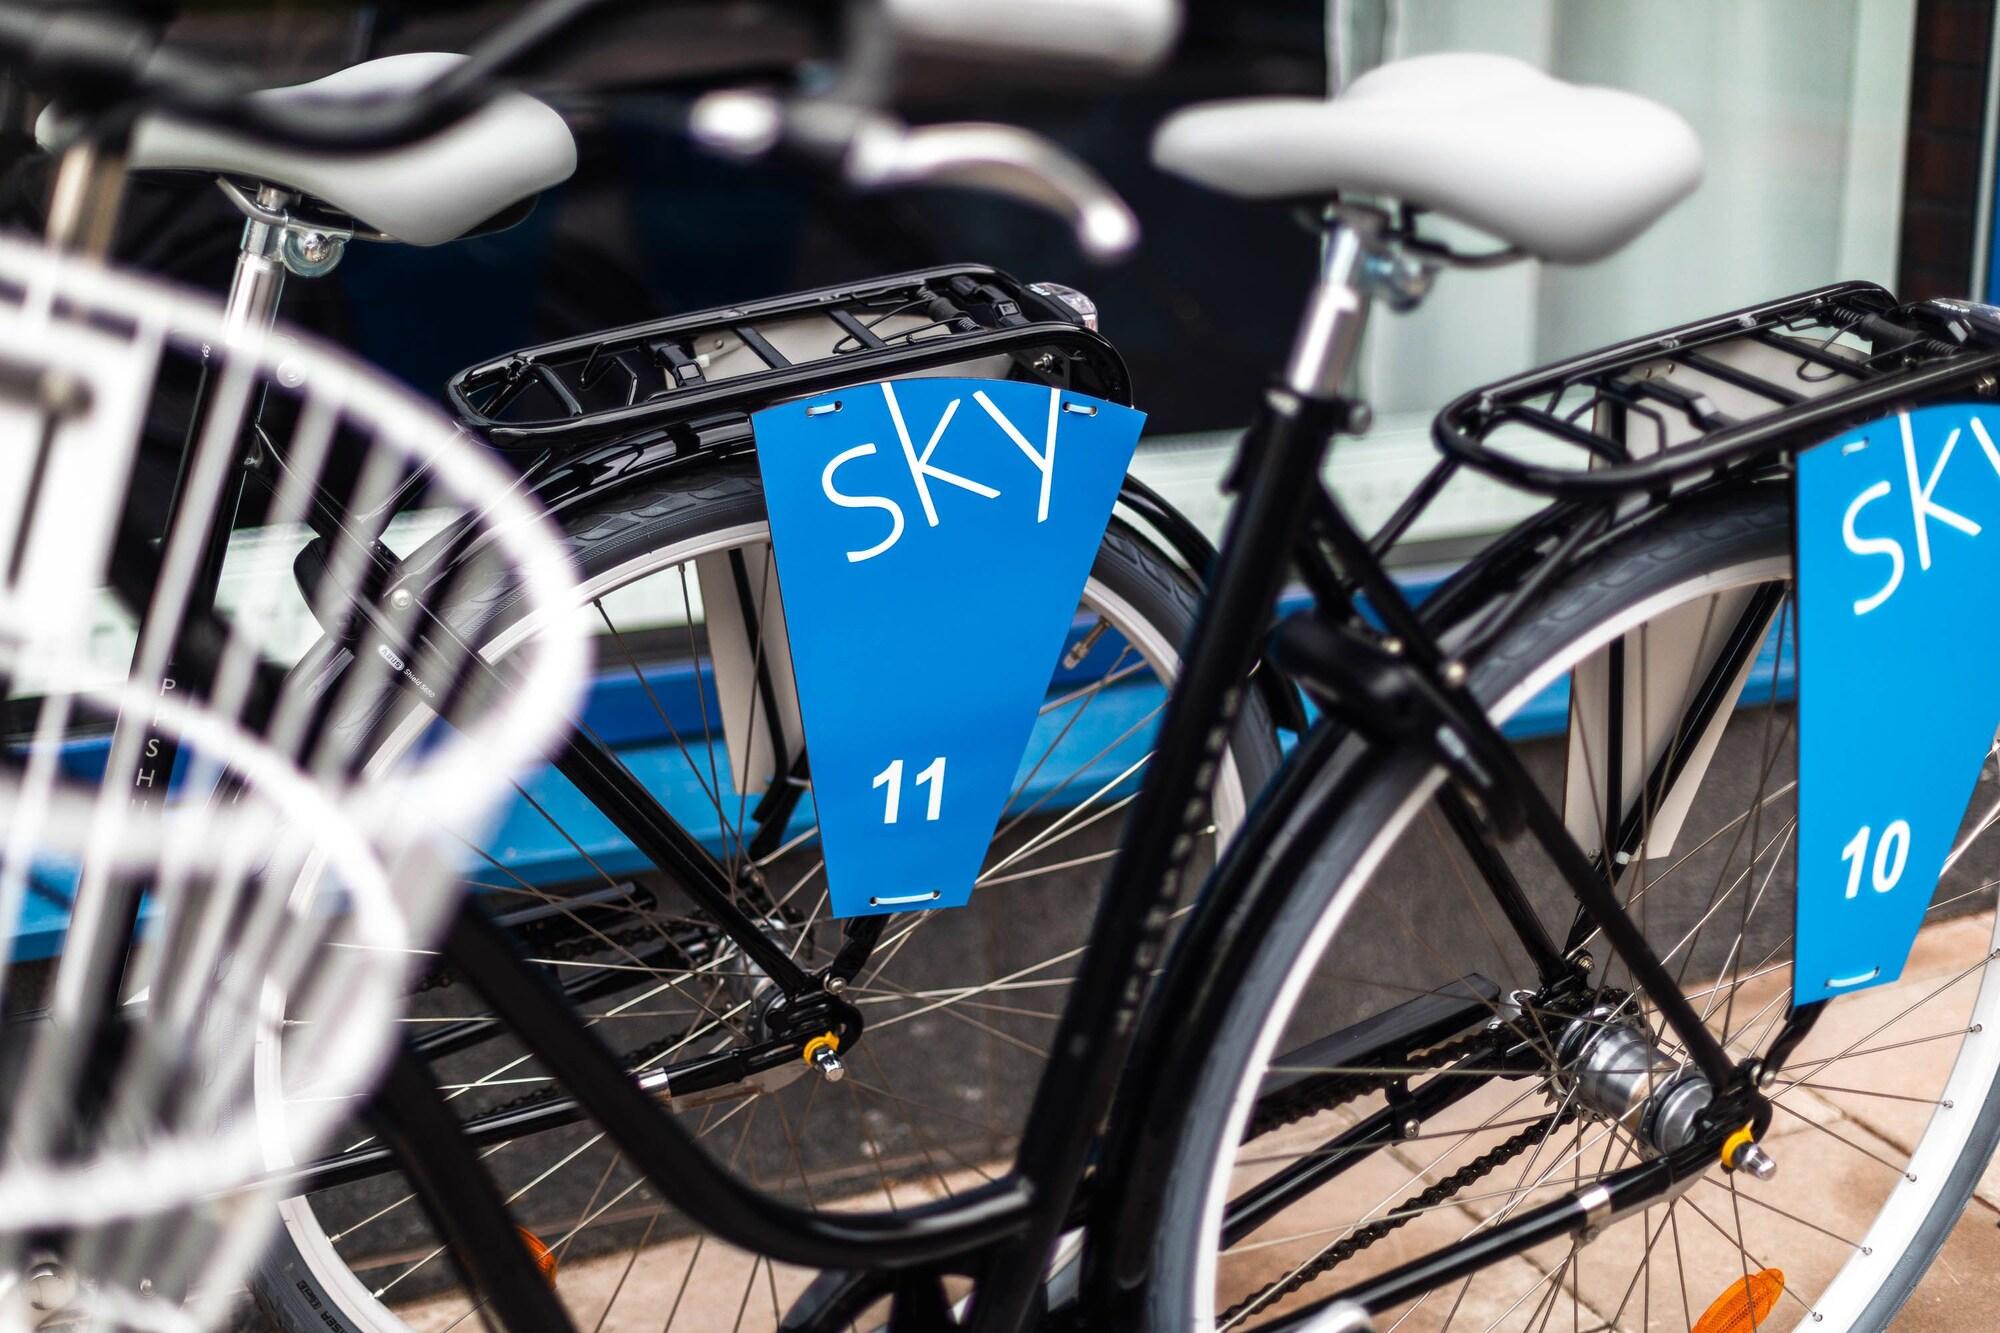 Sky Hotel Apartments City, Linköping